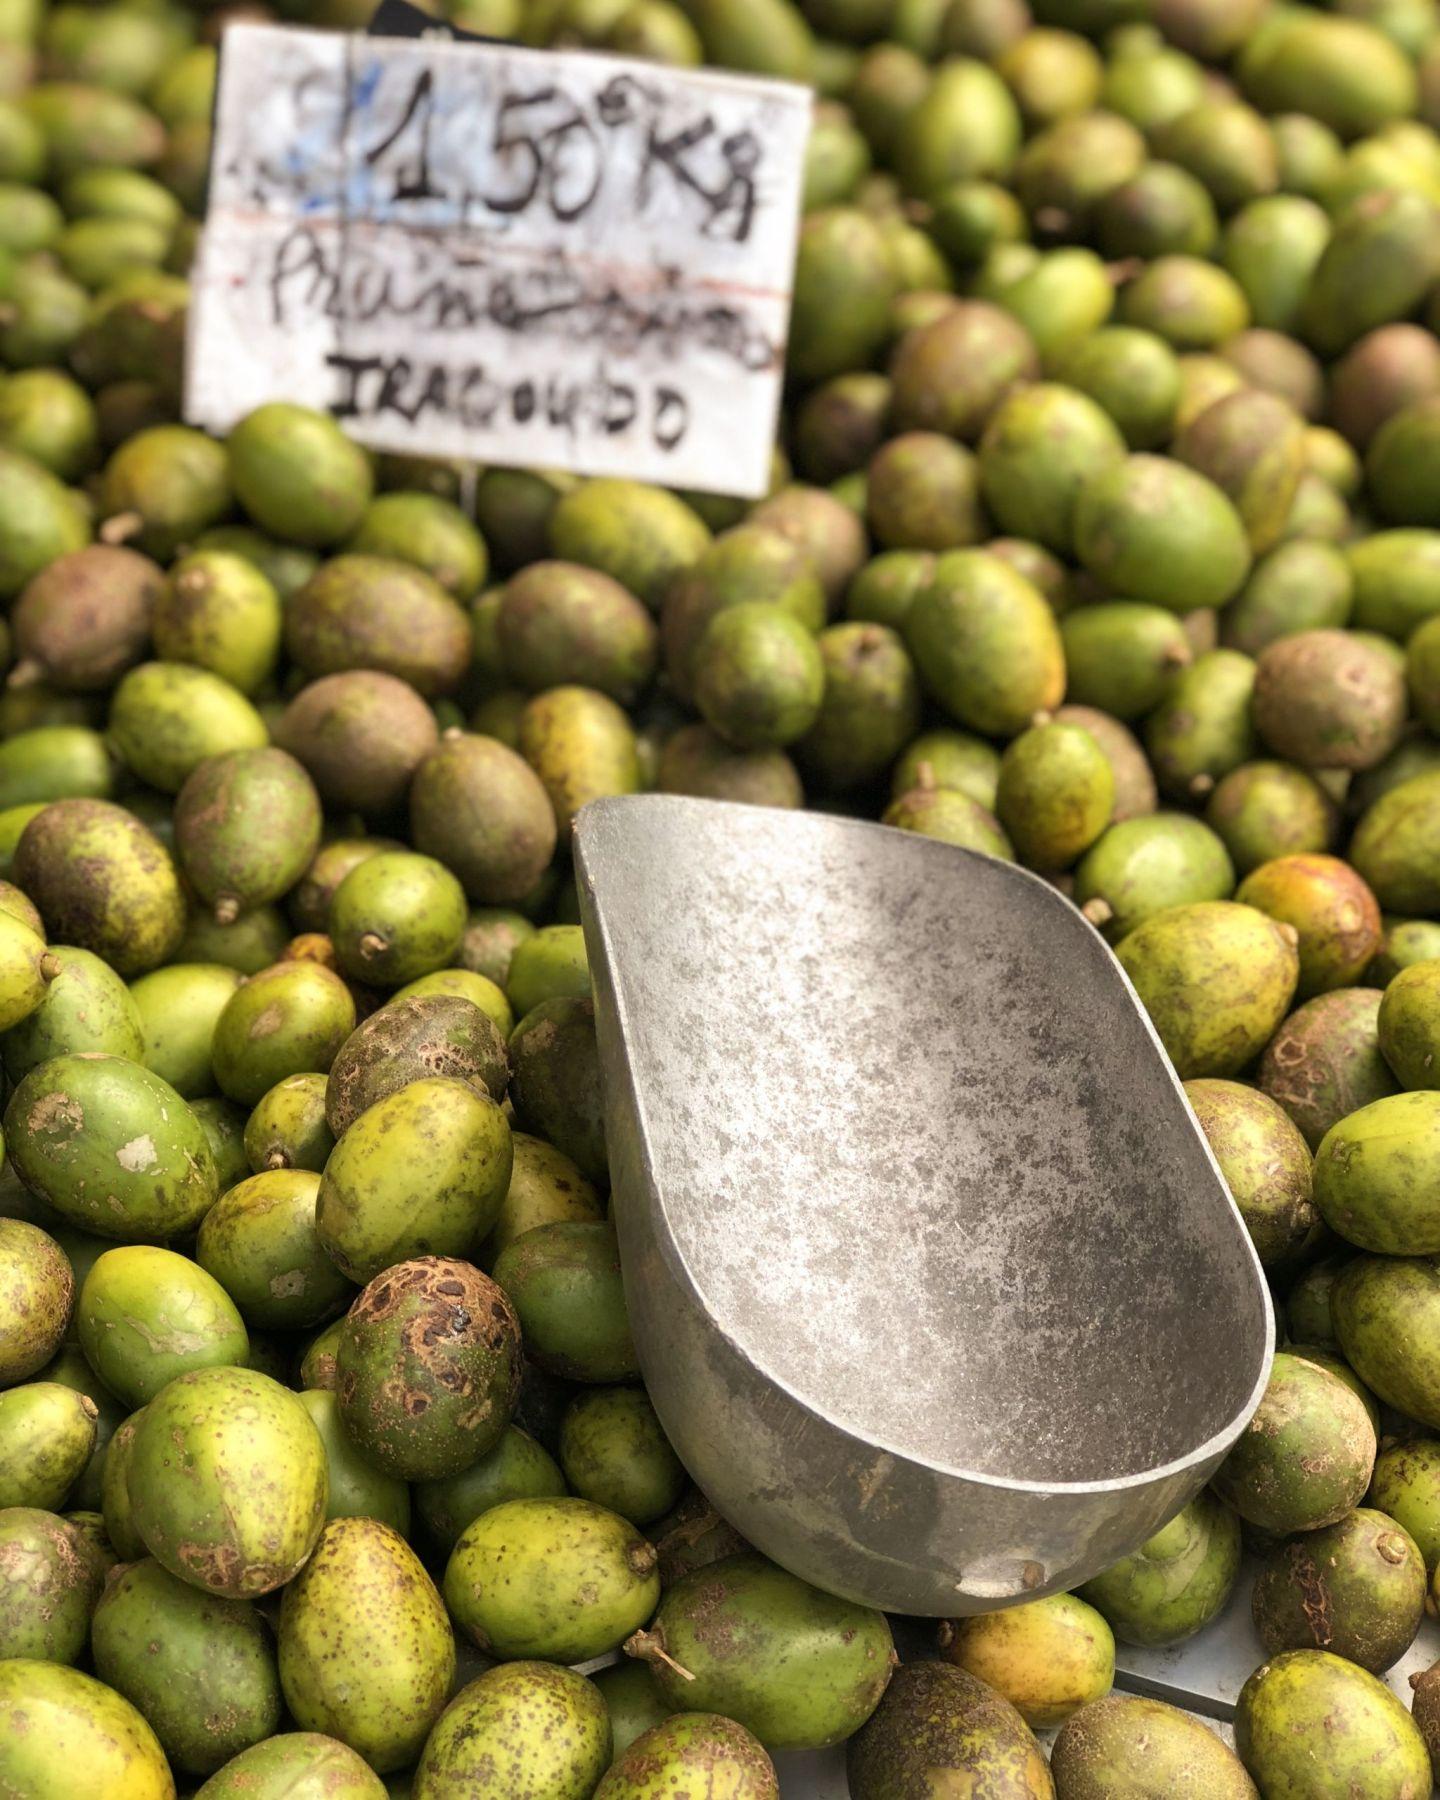 French Guiana mercado